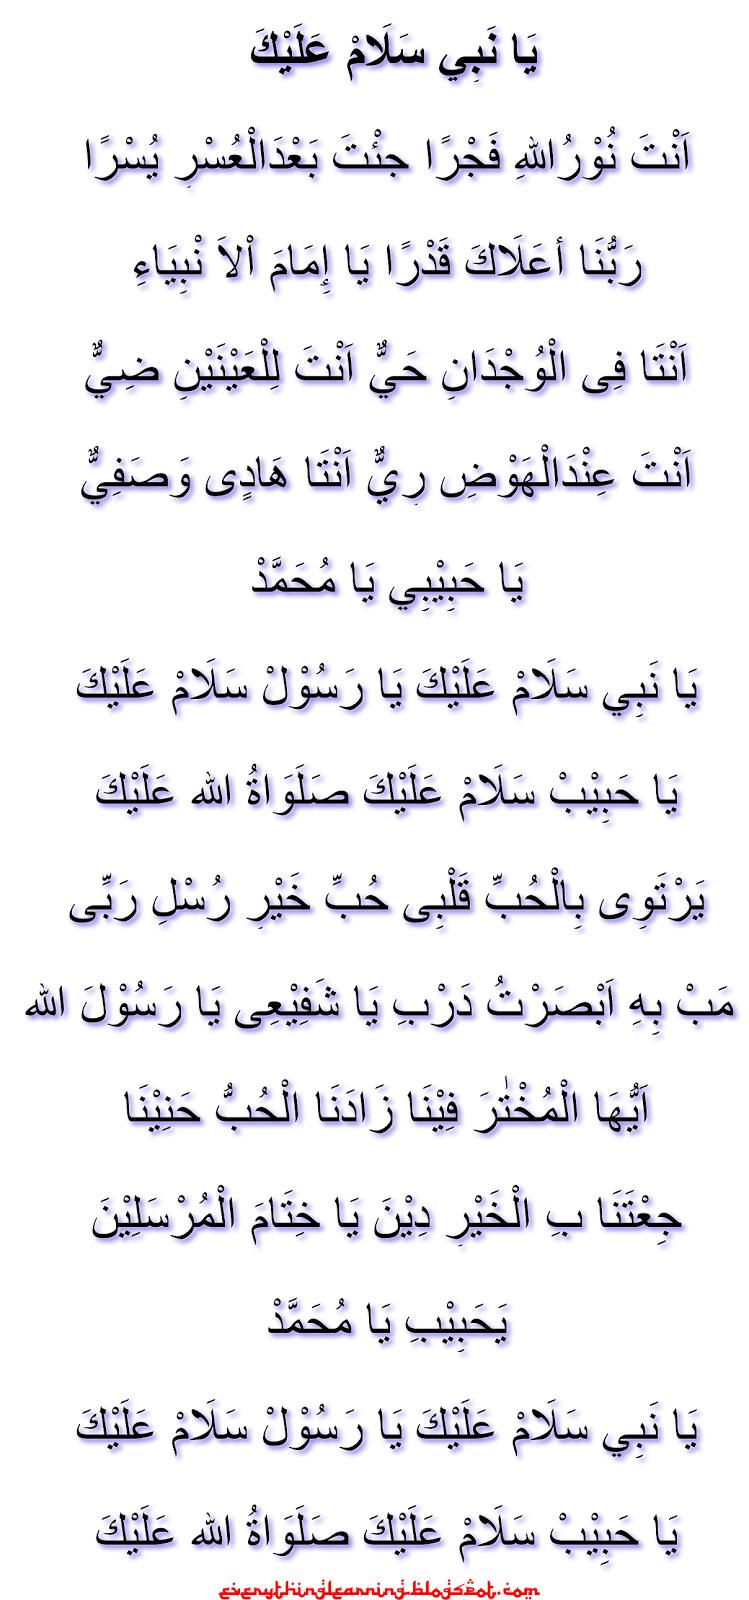 Lirik Lagu Maher Zain Ya Nabi Salam Alaika Dan Artinya